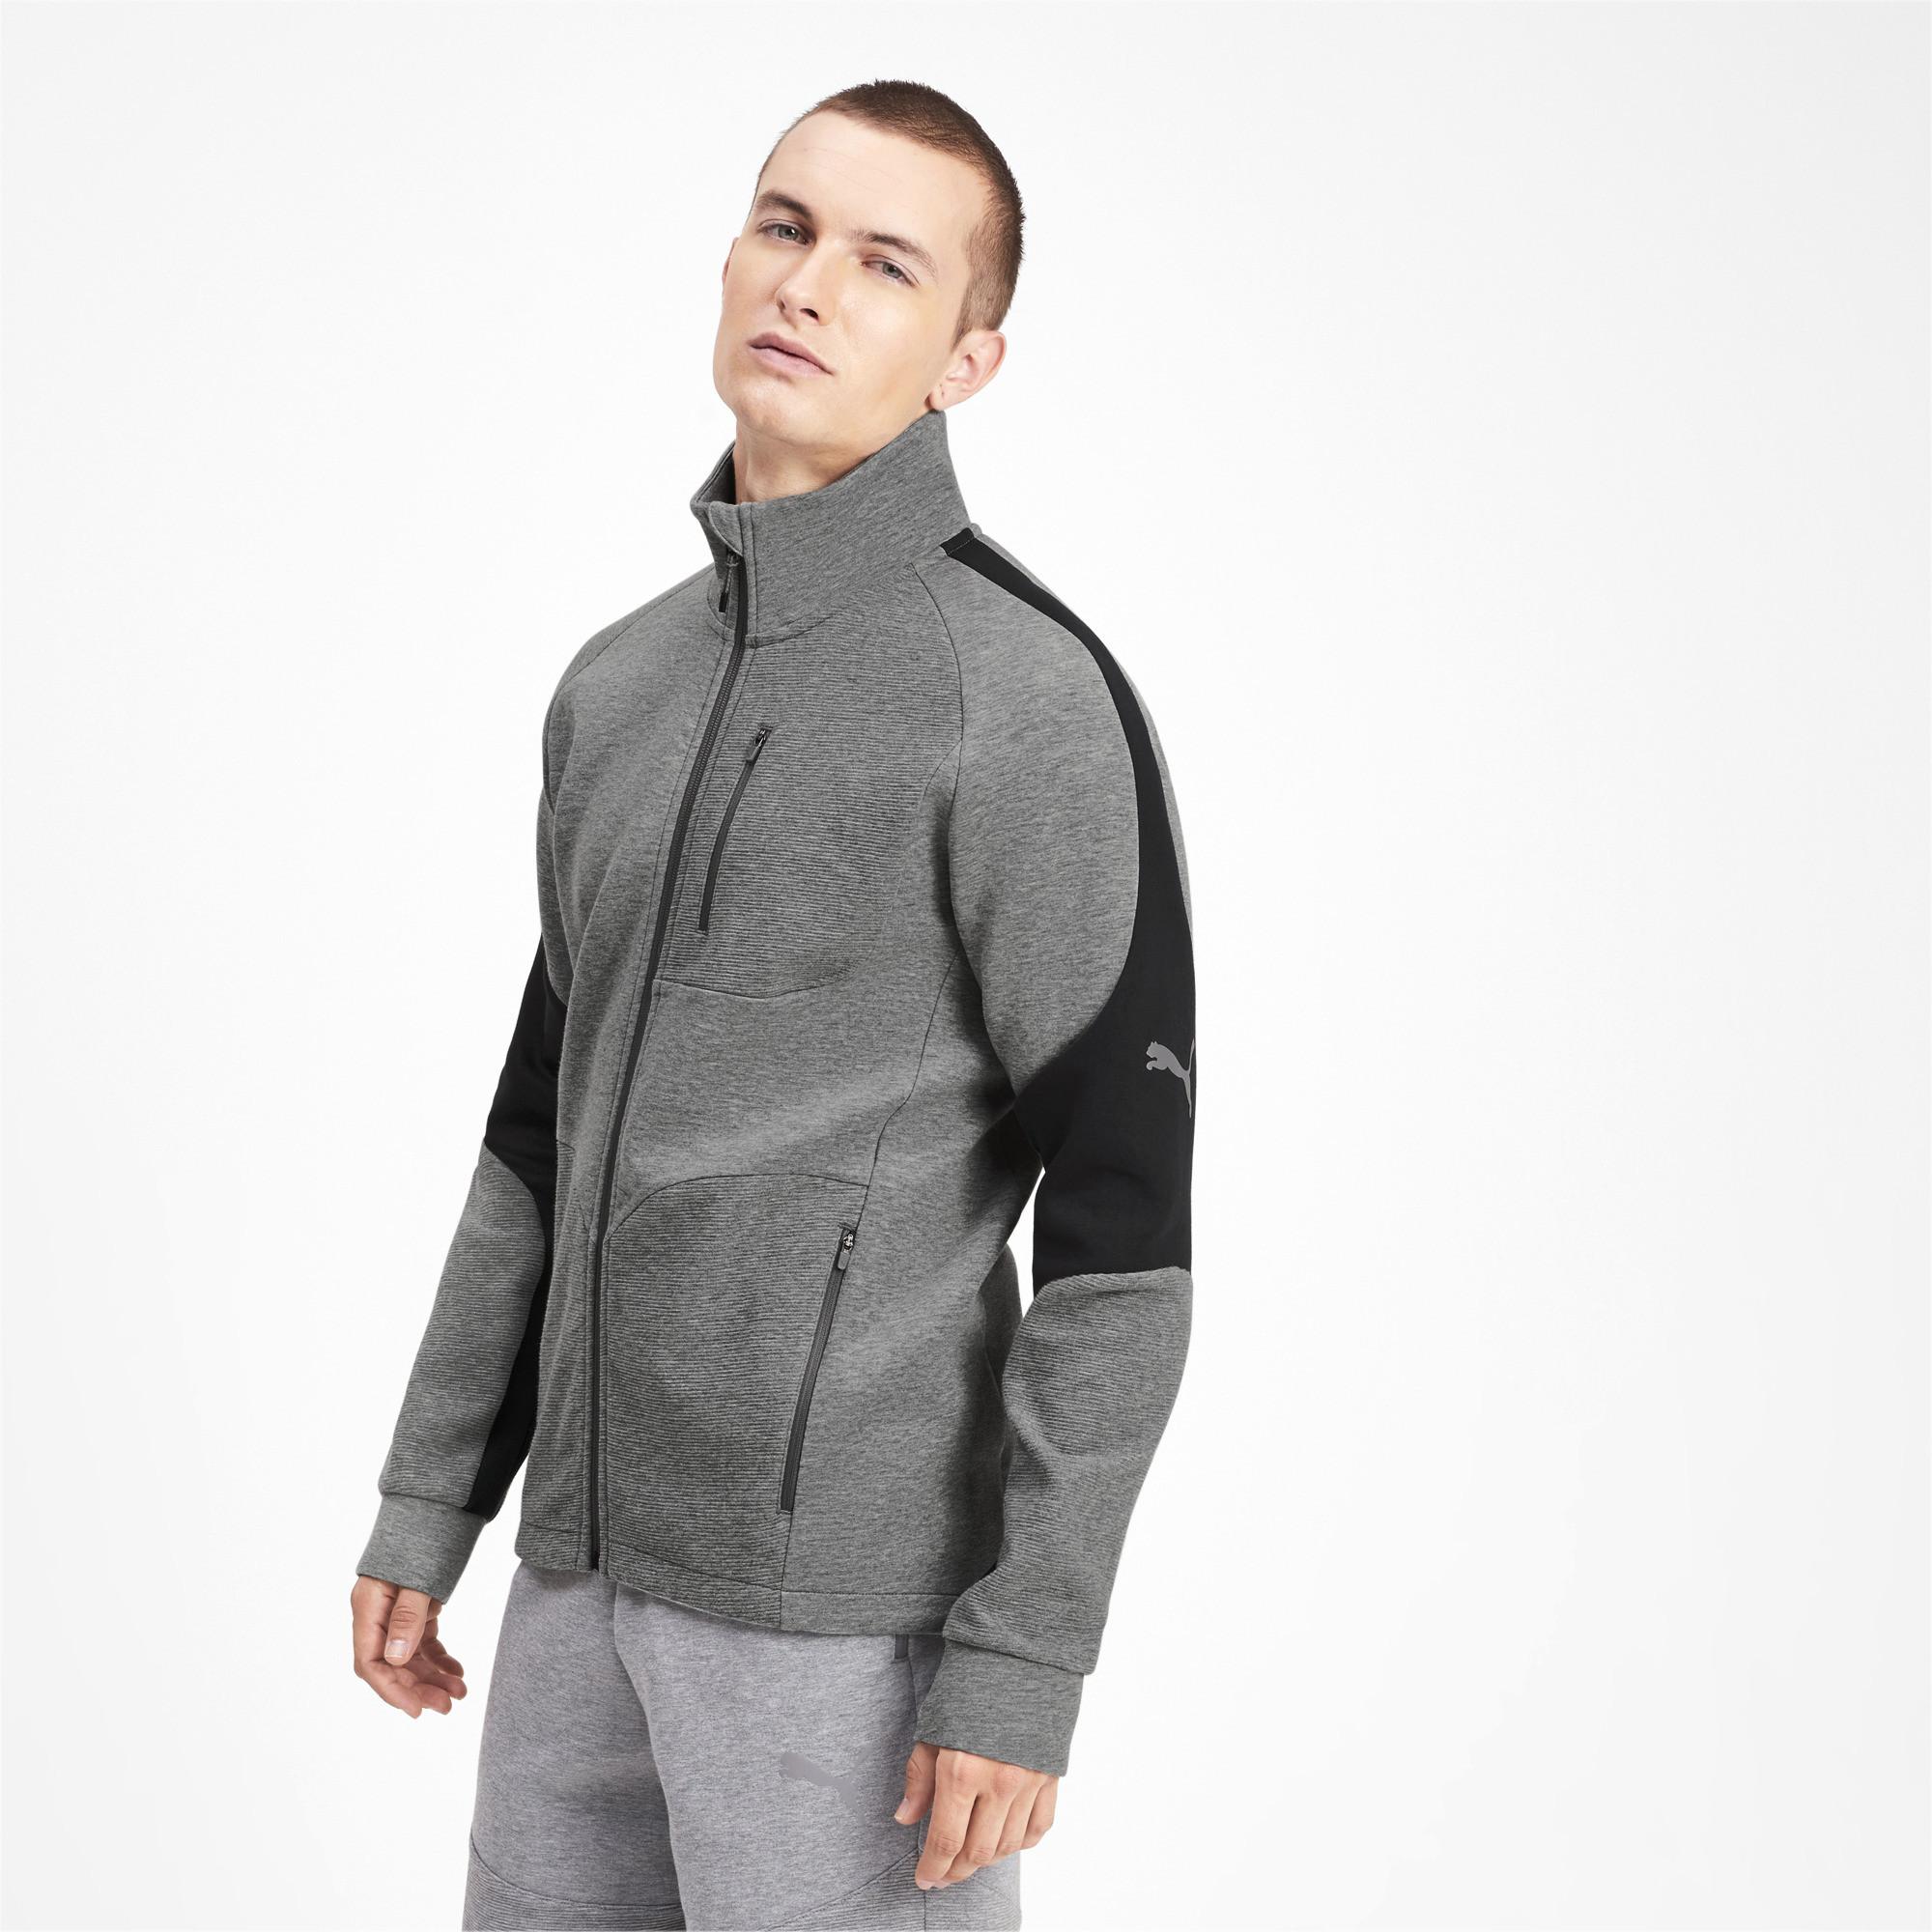 PUMA-Evostripe-Men-039-s-Jacket-Men-Sweat-Basics thumbnail 9